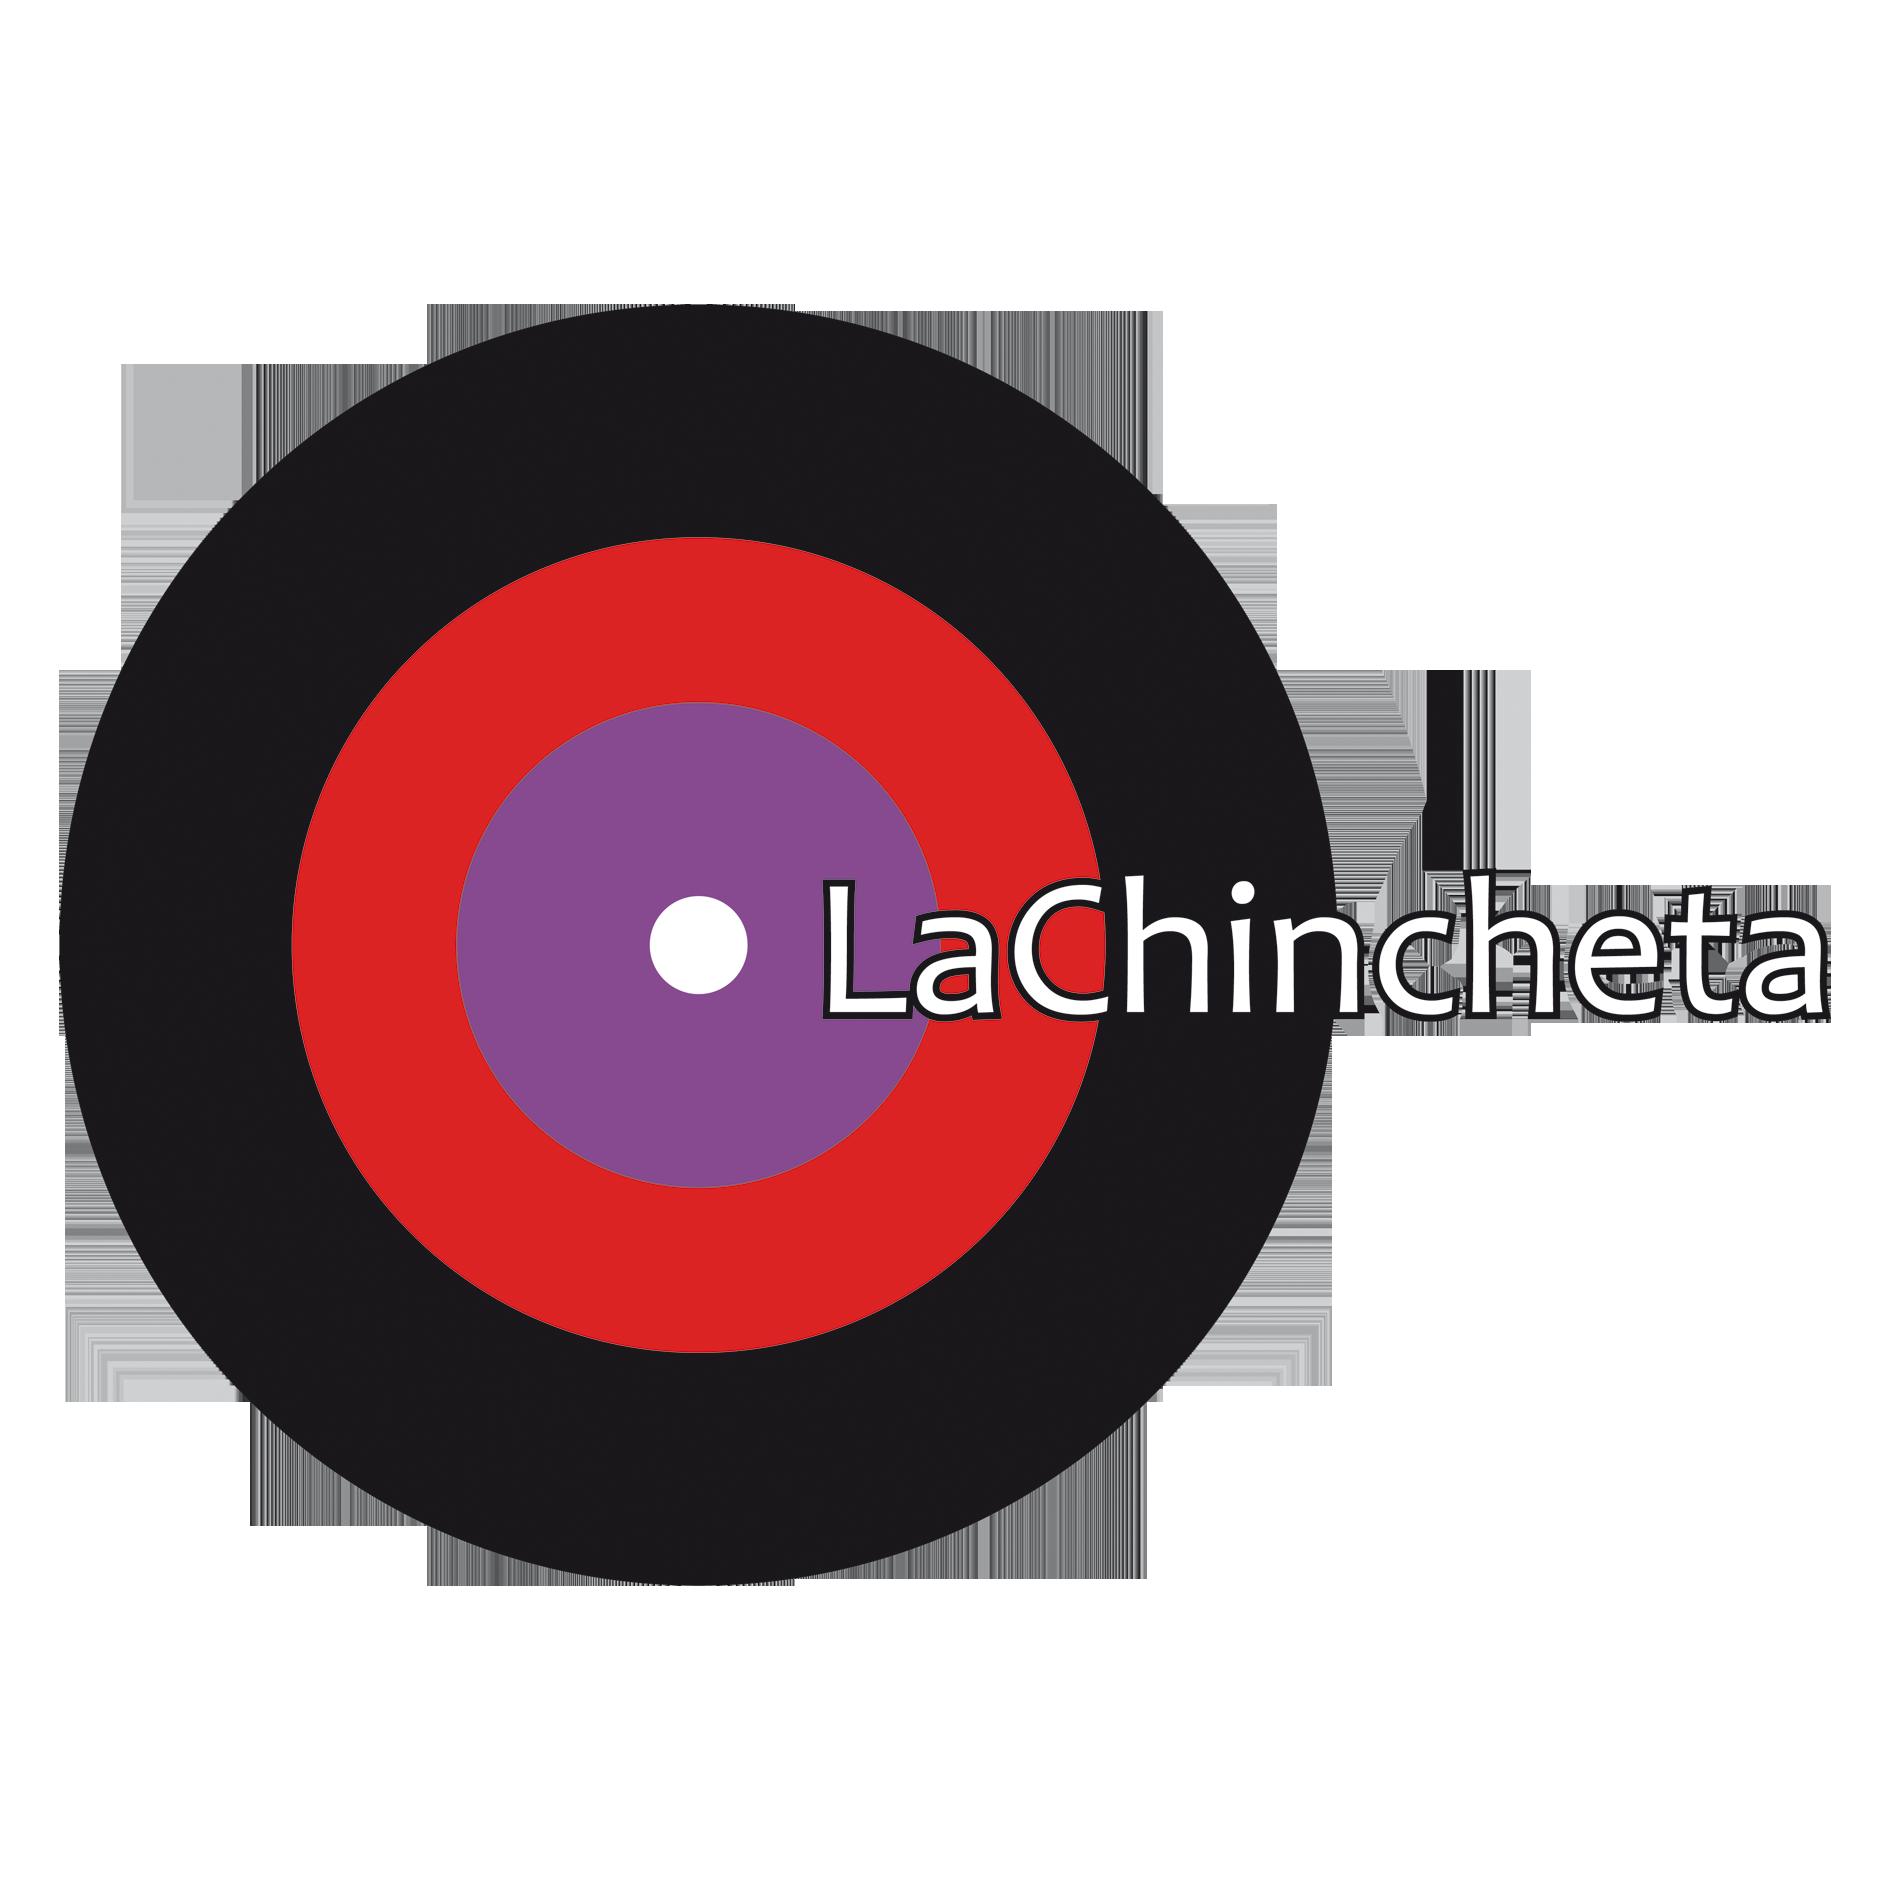 lachincheta.png